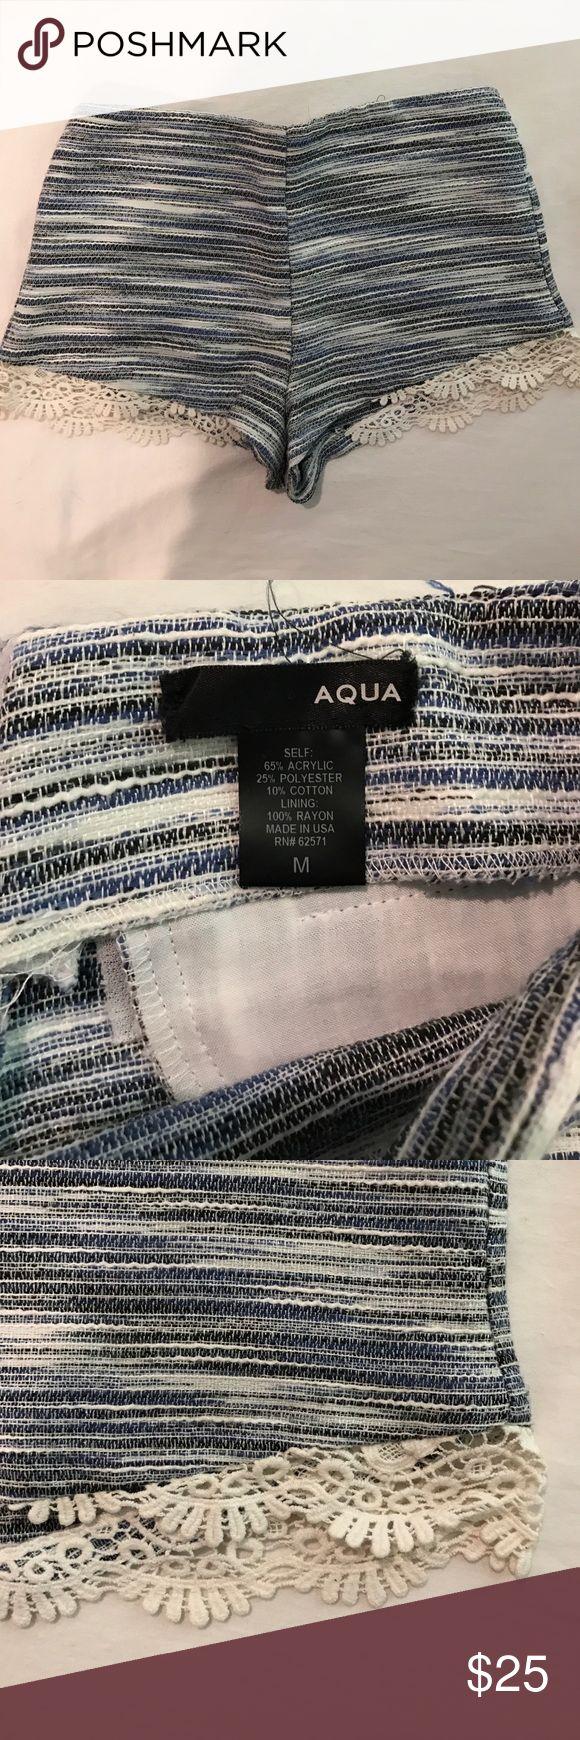 AQUA tweed shorts with lace trim size medium multi blue tweed patterned shorts with scalloped lace trim worn twice Aqua Shorts